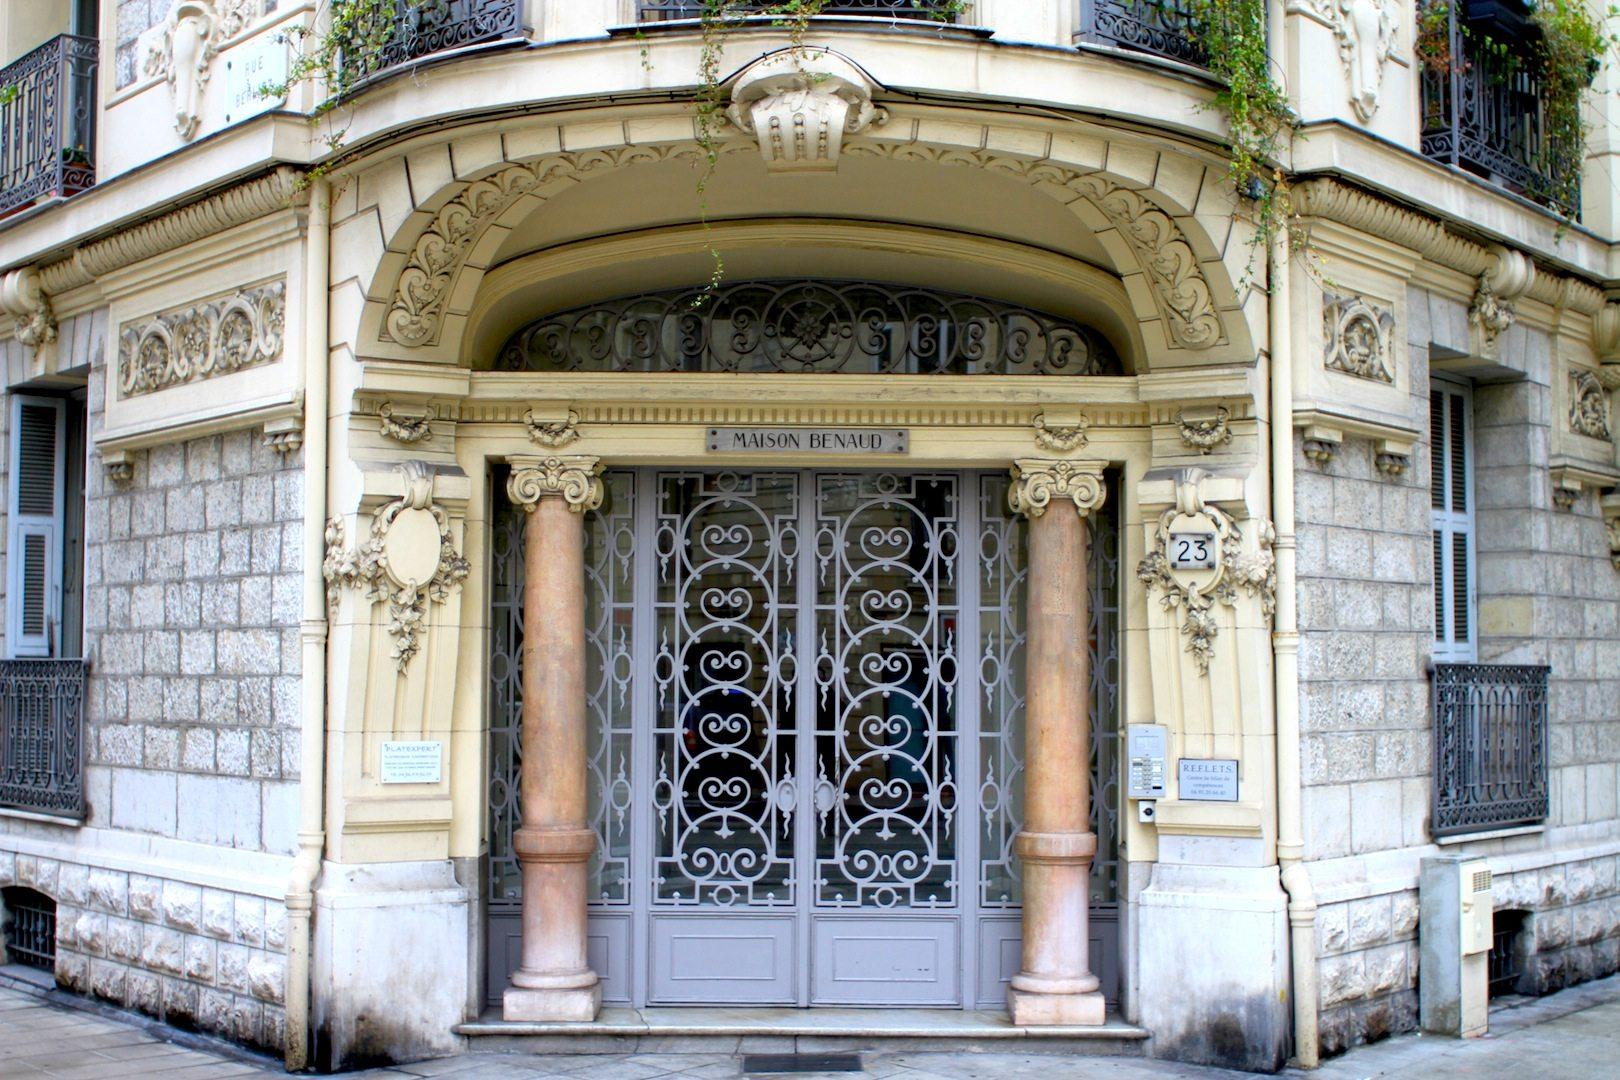 Maison Benaud.  Rue Berlioz / Rue Rossini, Nizza